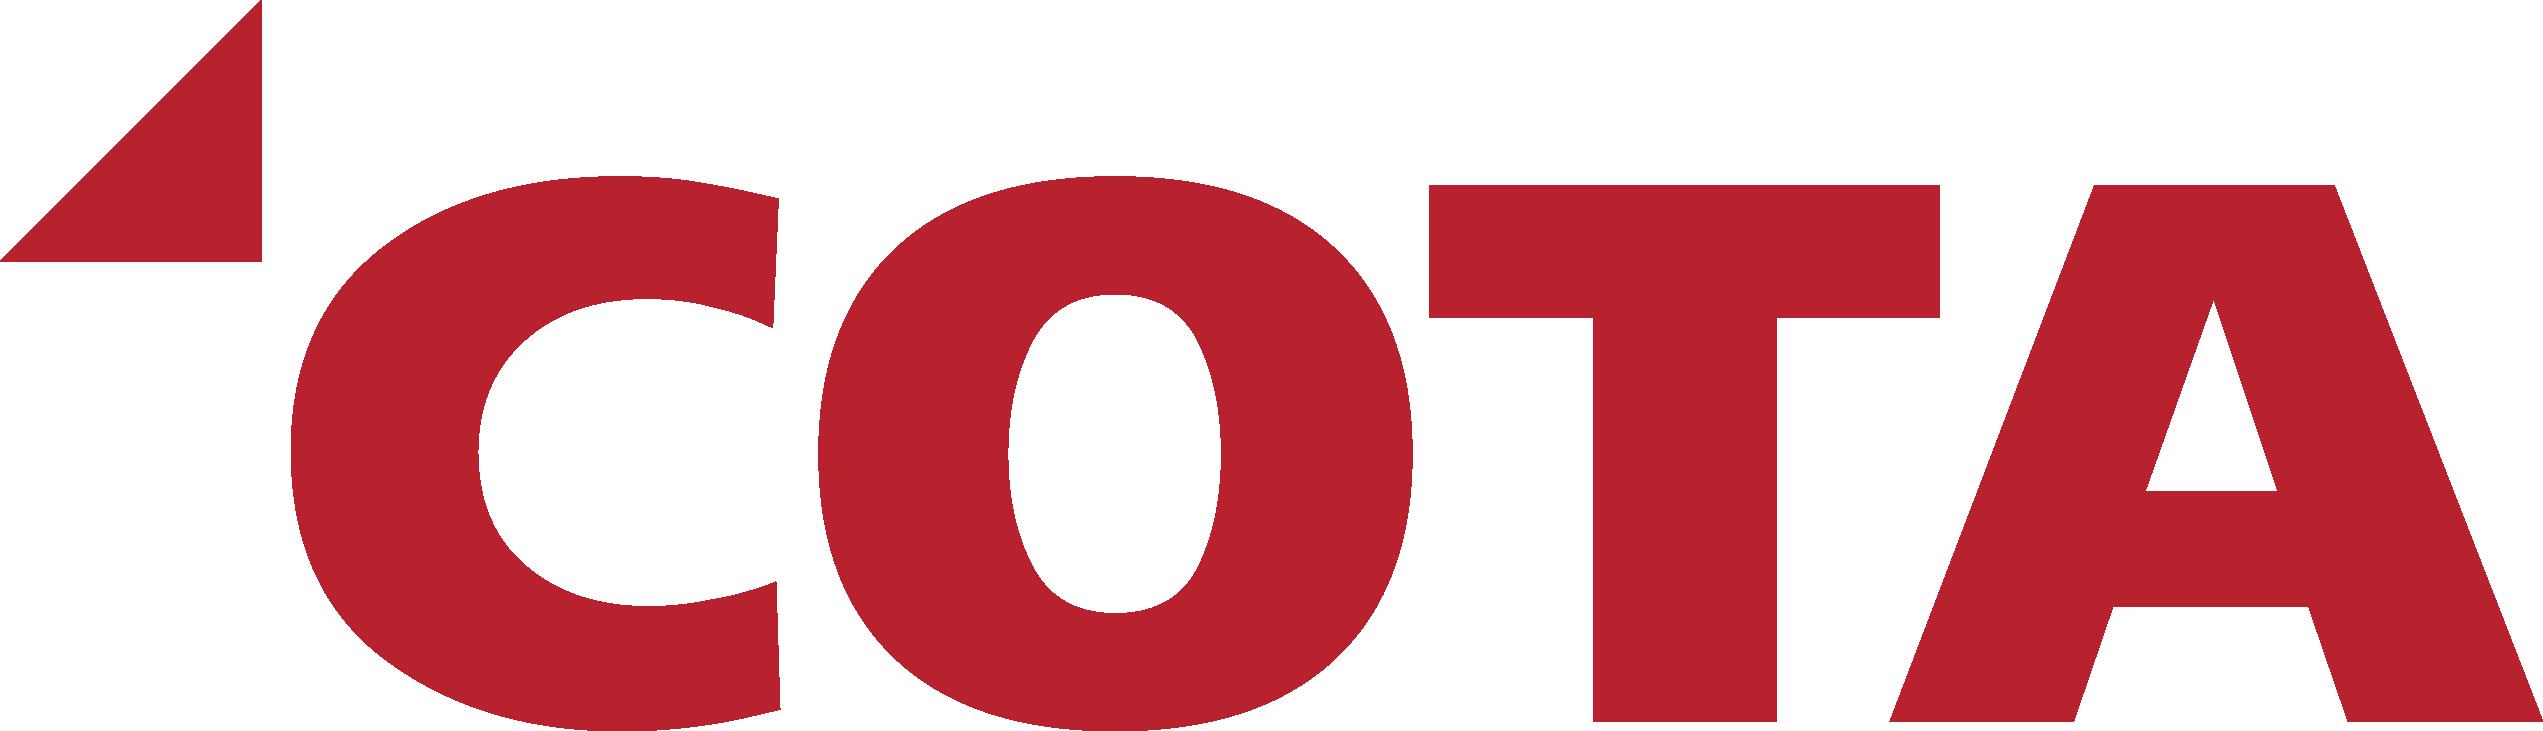 cota-logo-red